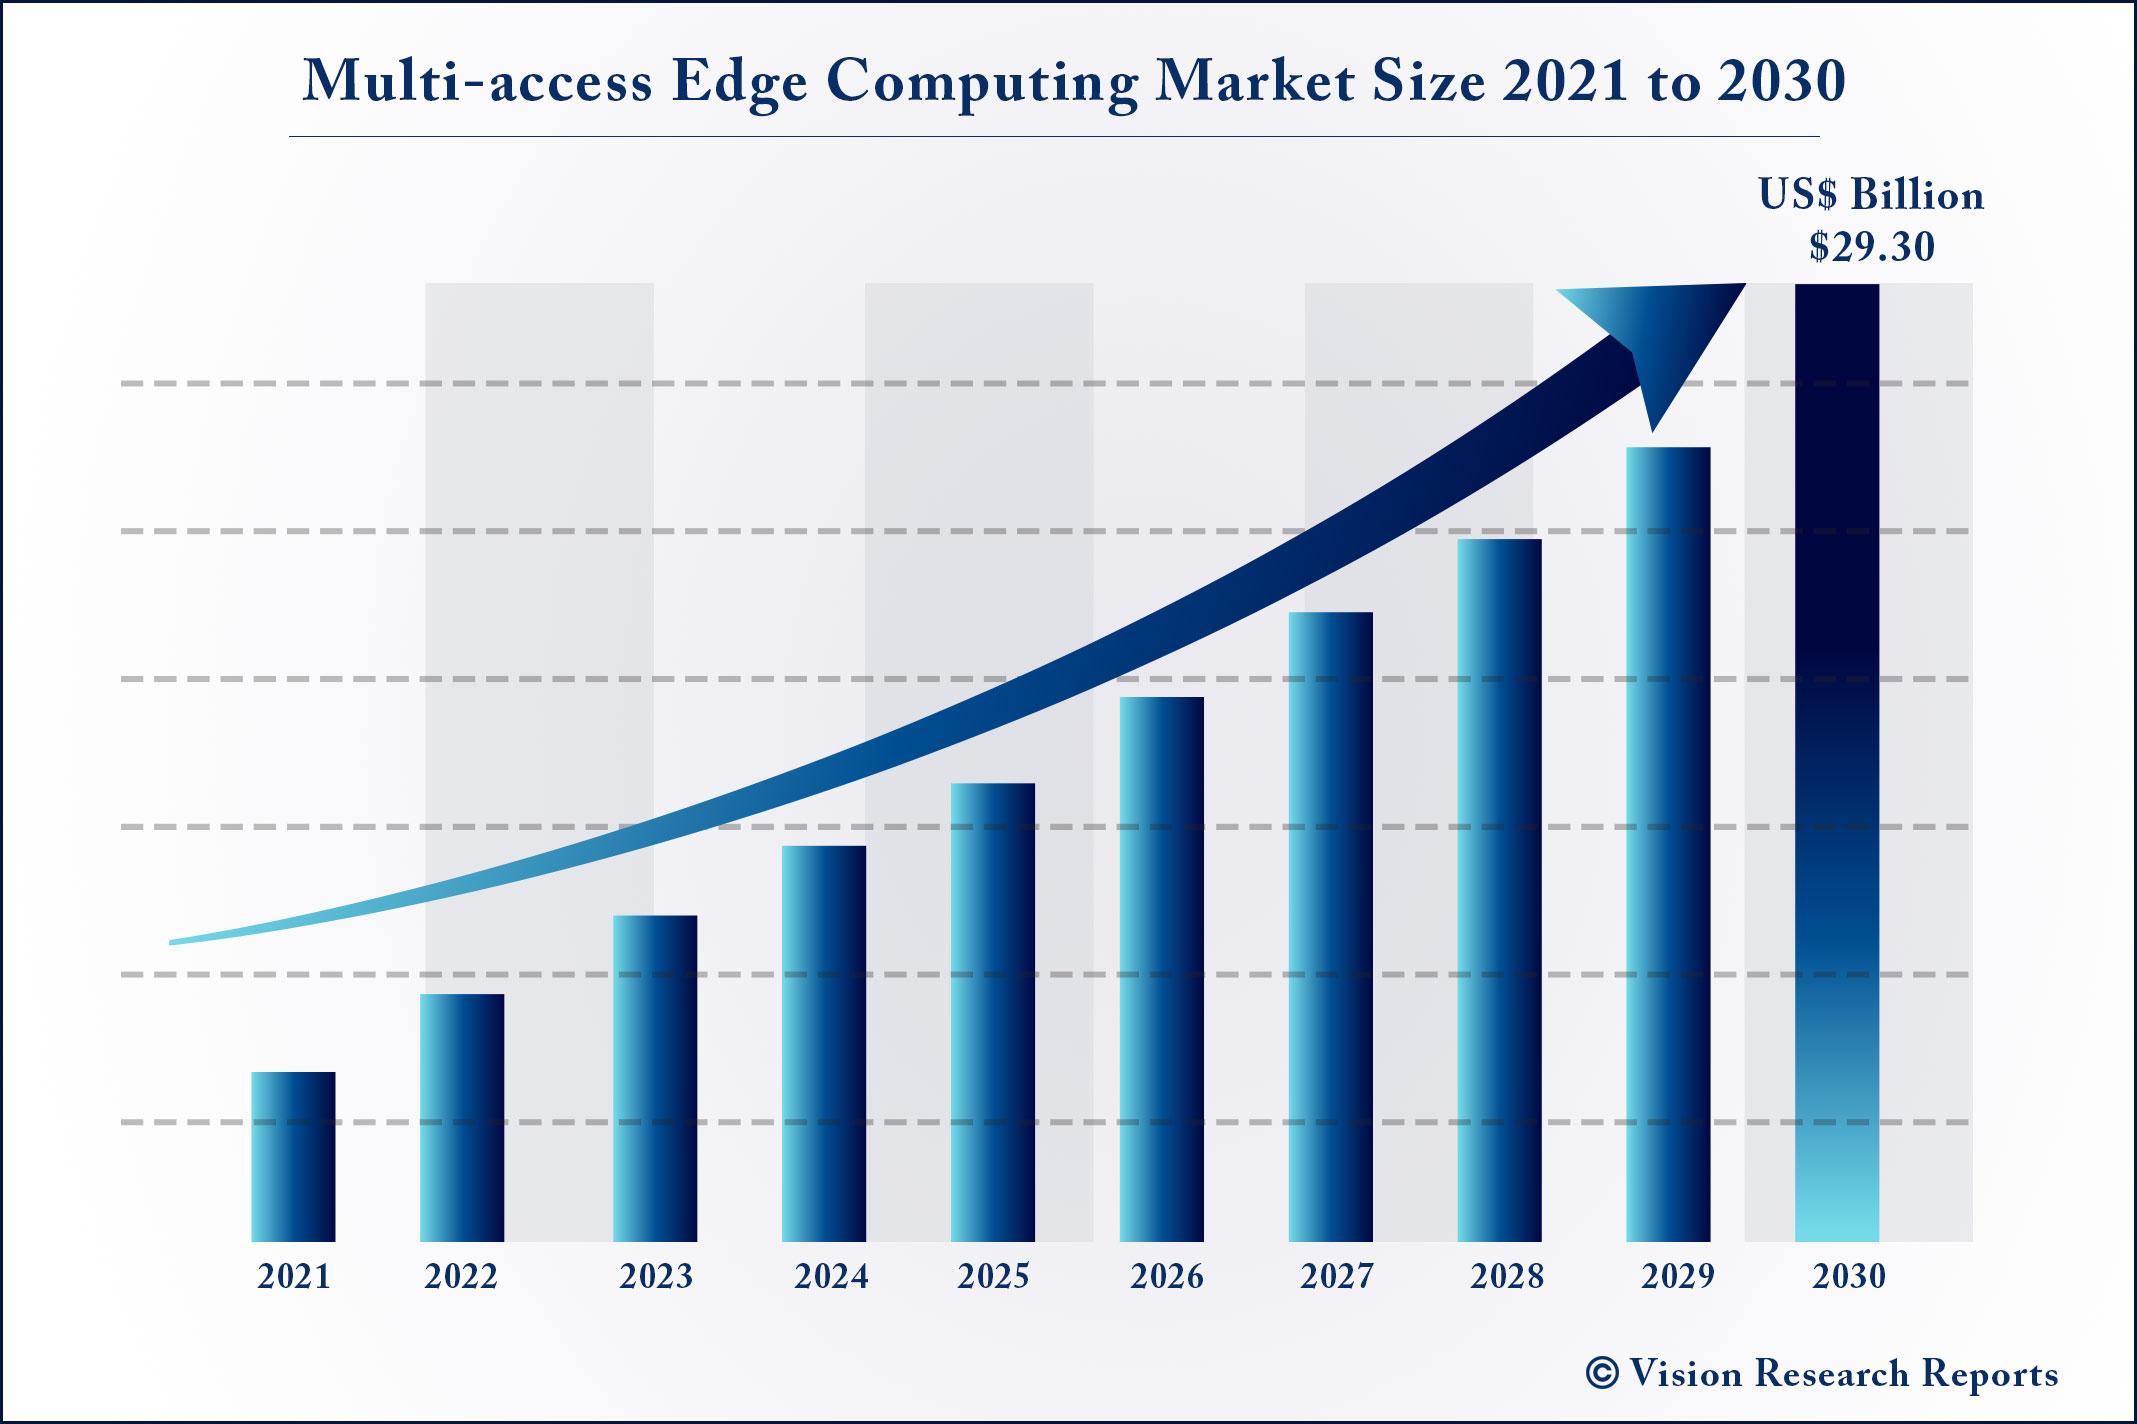 Multi-access Edge Computing Market Size 2021 to 2030